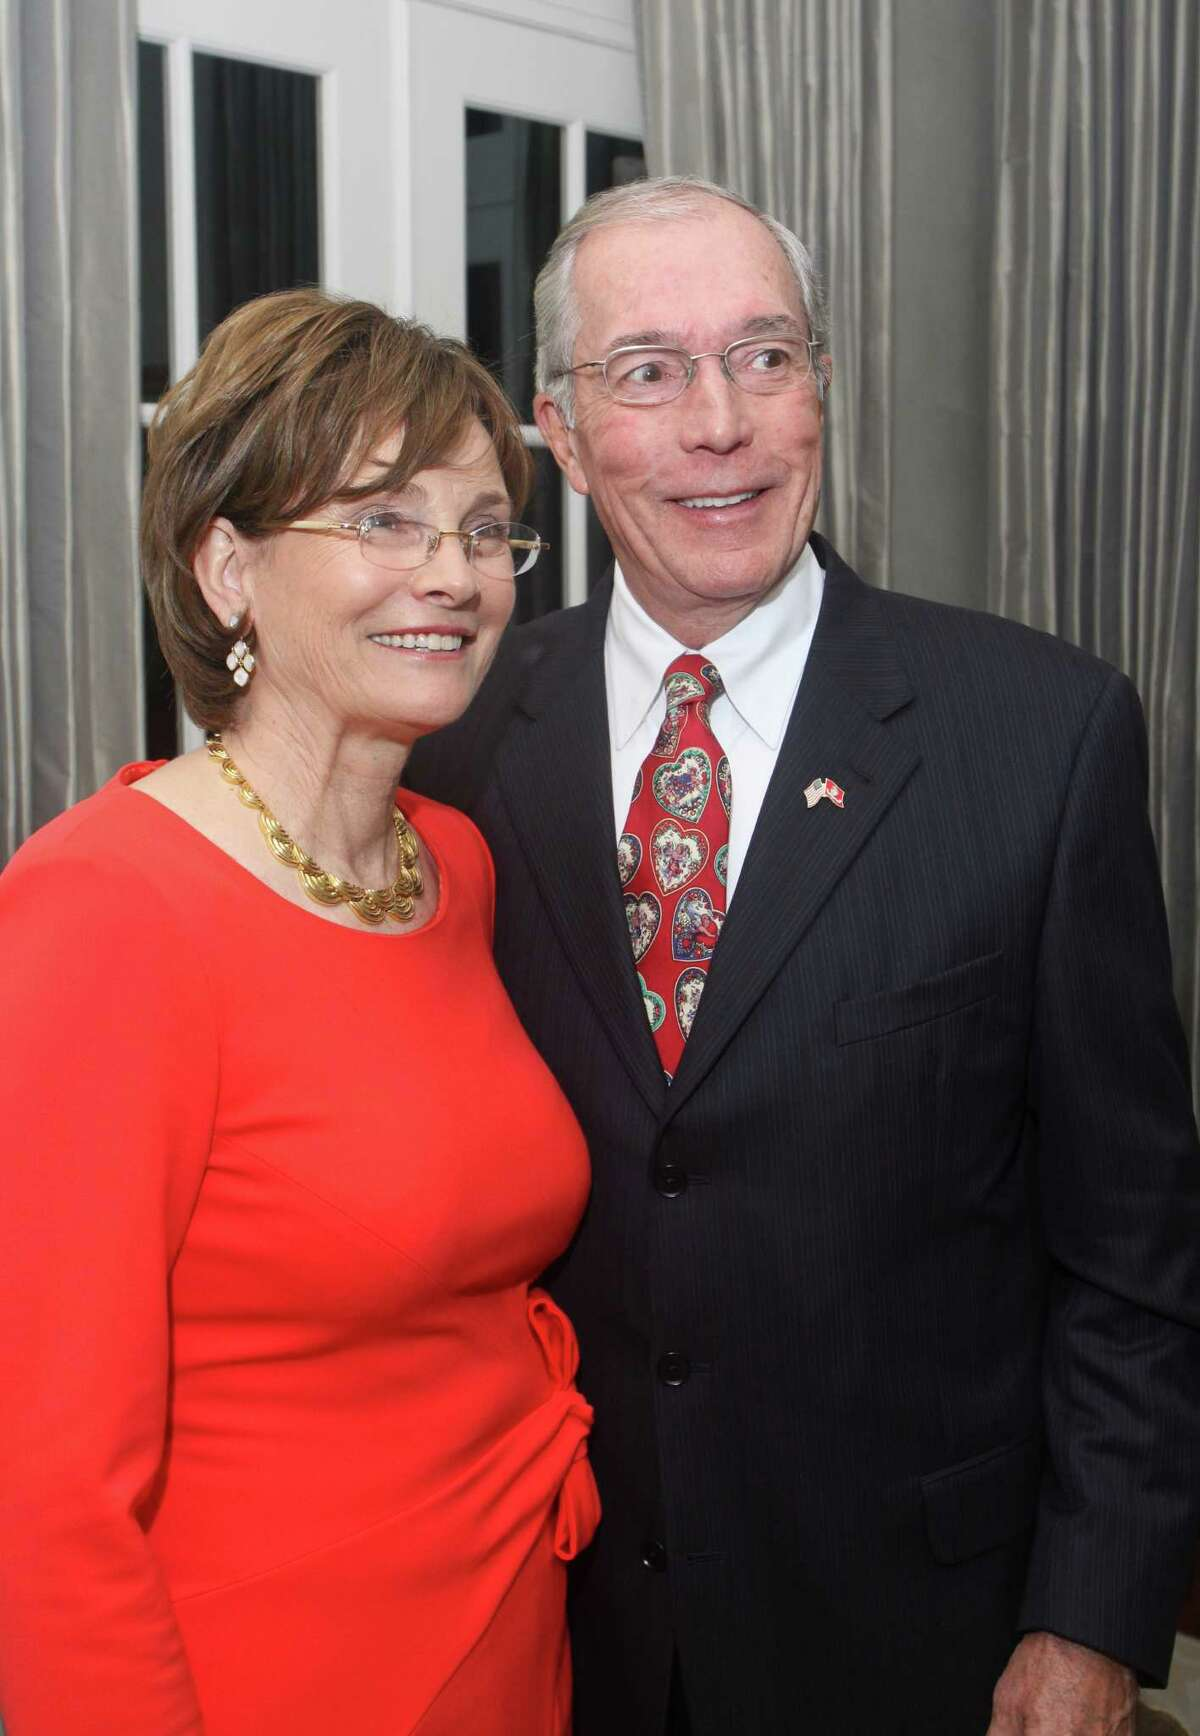 (For the Chronicle/Gary Fountain, January 25, 2012) Chairs Bobbie and John Nau.